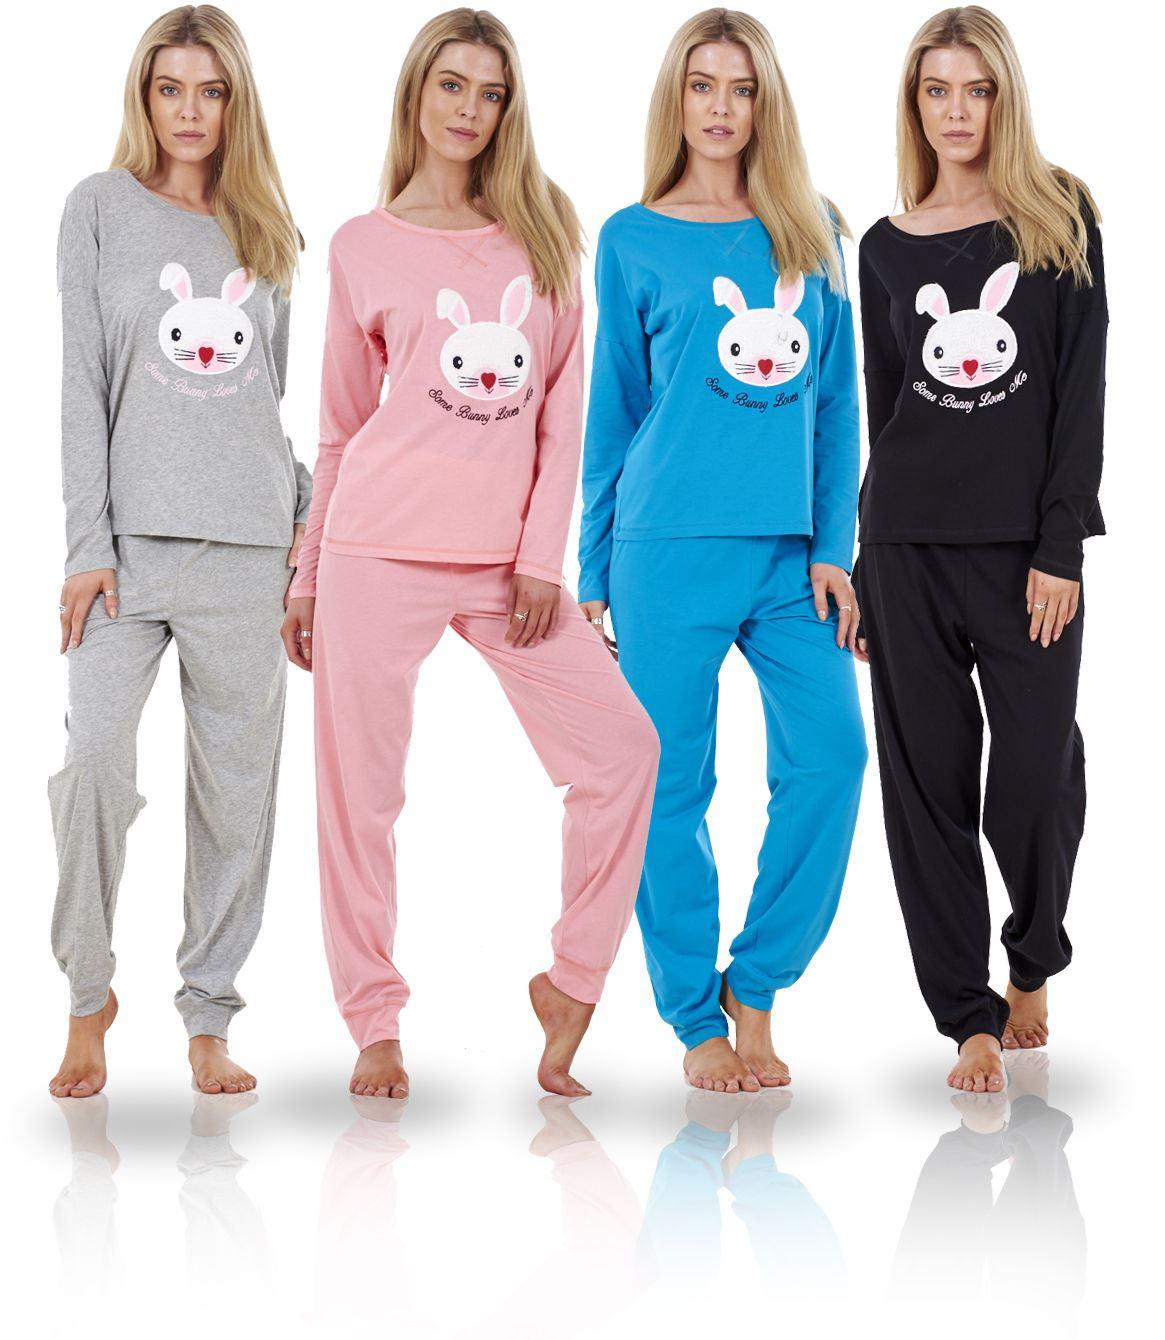 4c871d16d8 Sentinel Ladies Long Sleeve Pyjama Set Womens Cotton Animal Print PJ S  Nightwear